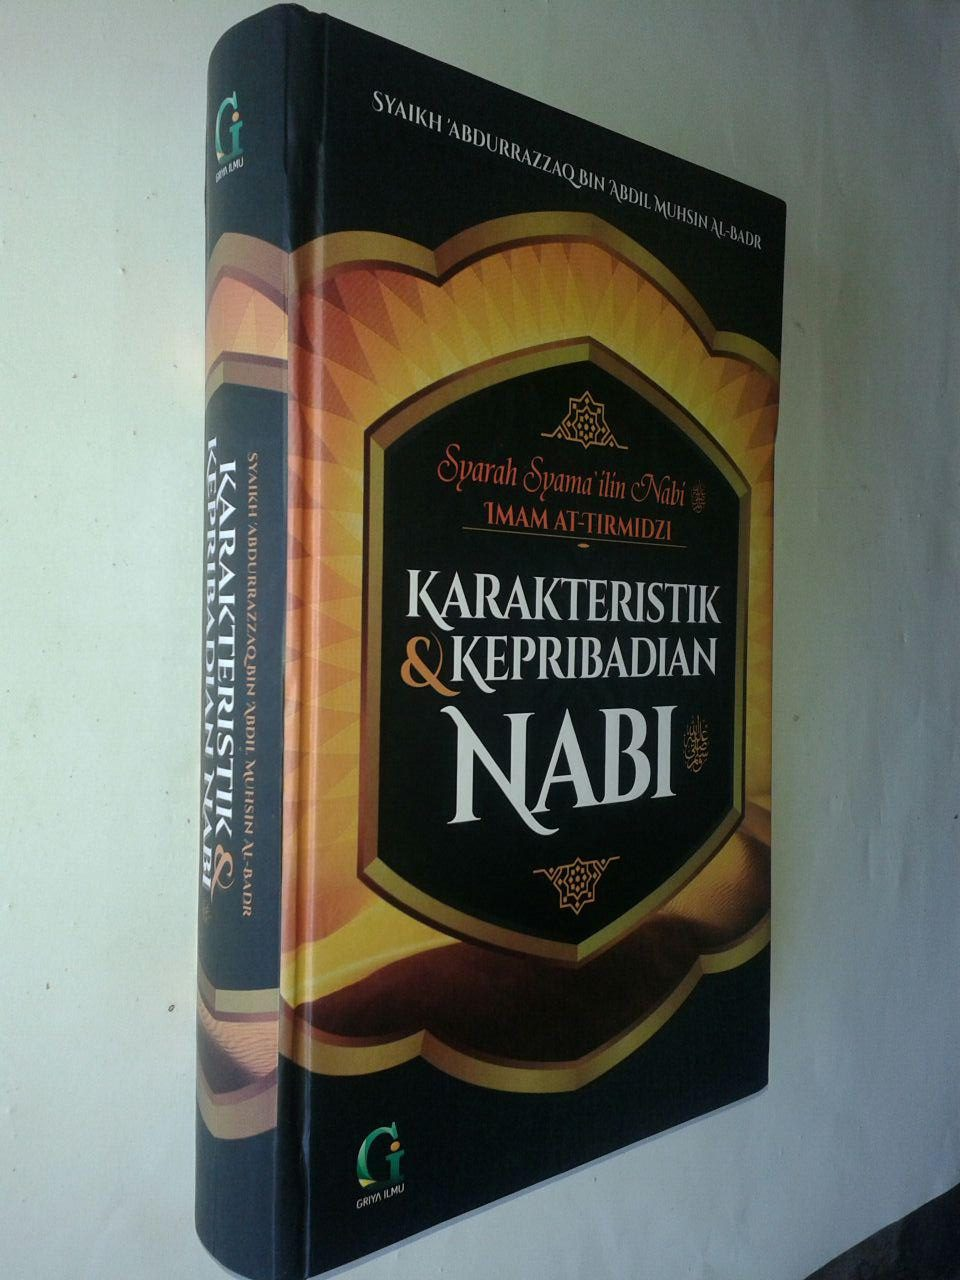 Buku Karakteristik Dan Kepribadian Nabi Syarah Syamailin Nabi cover 2